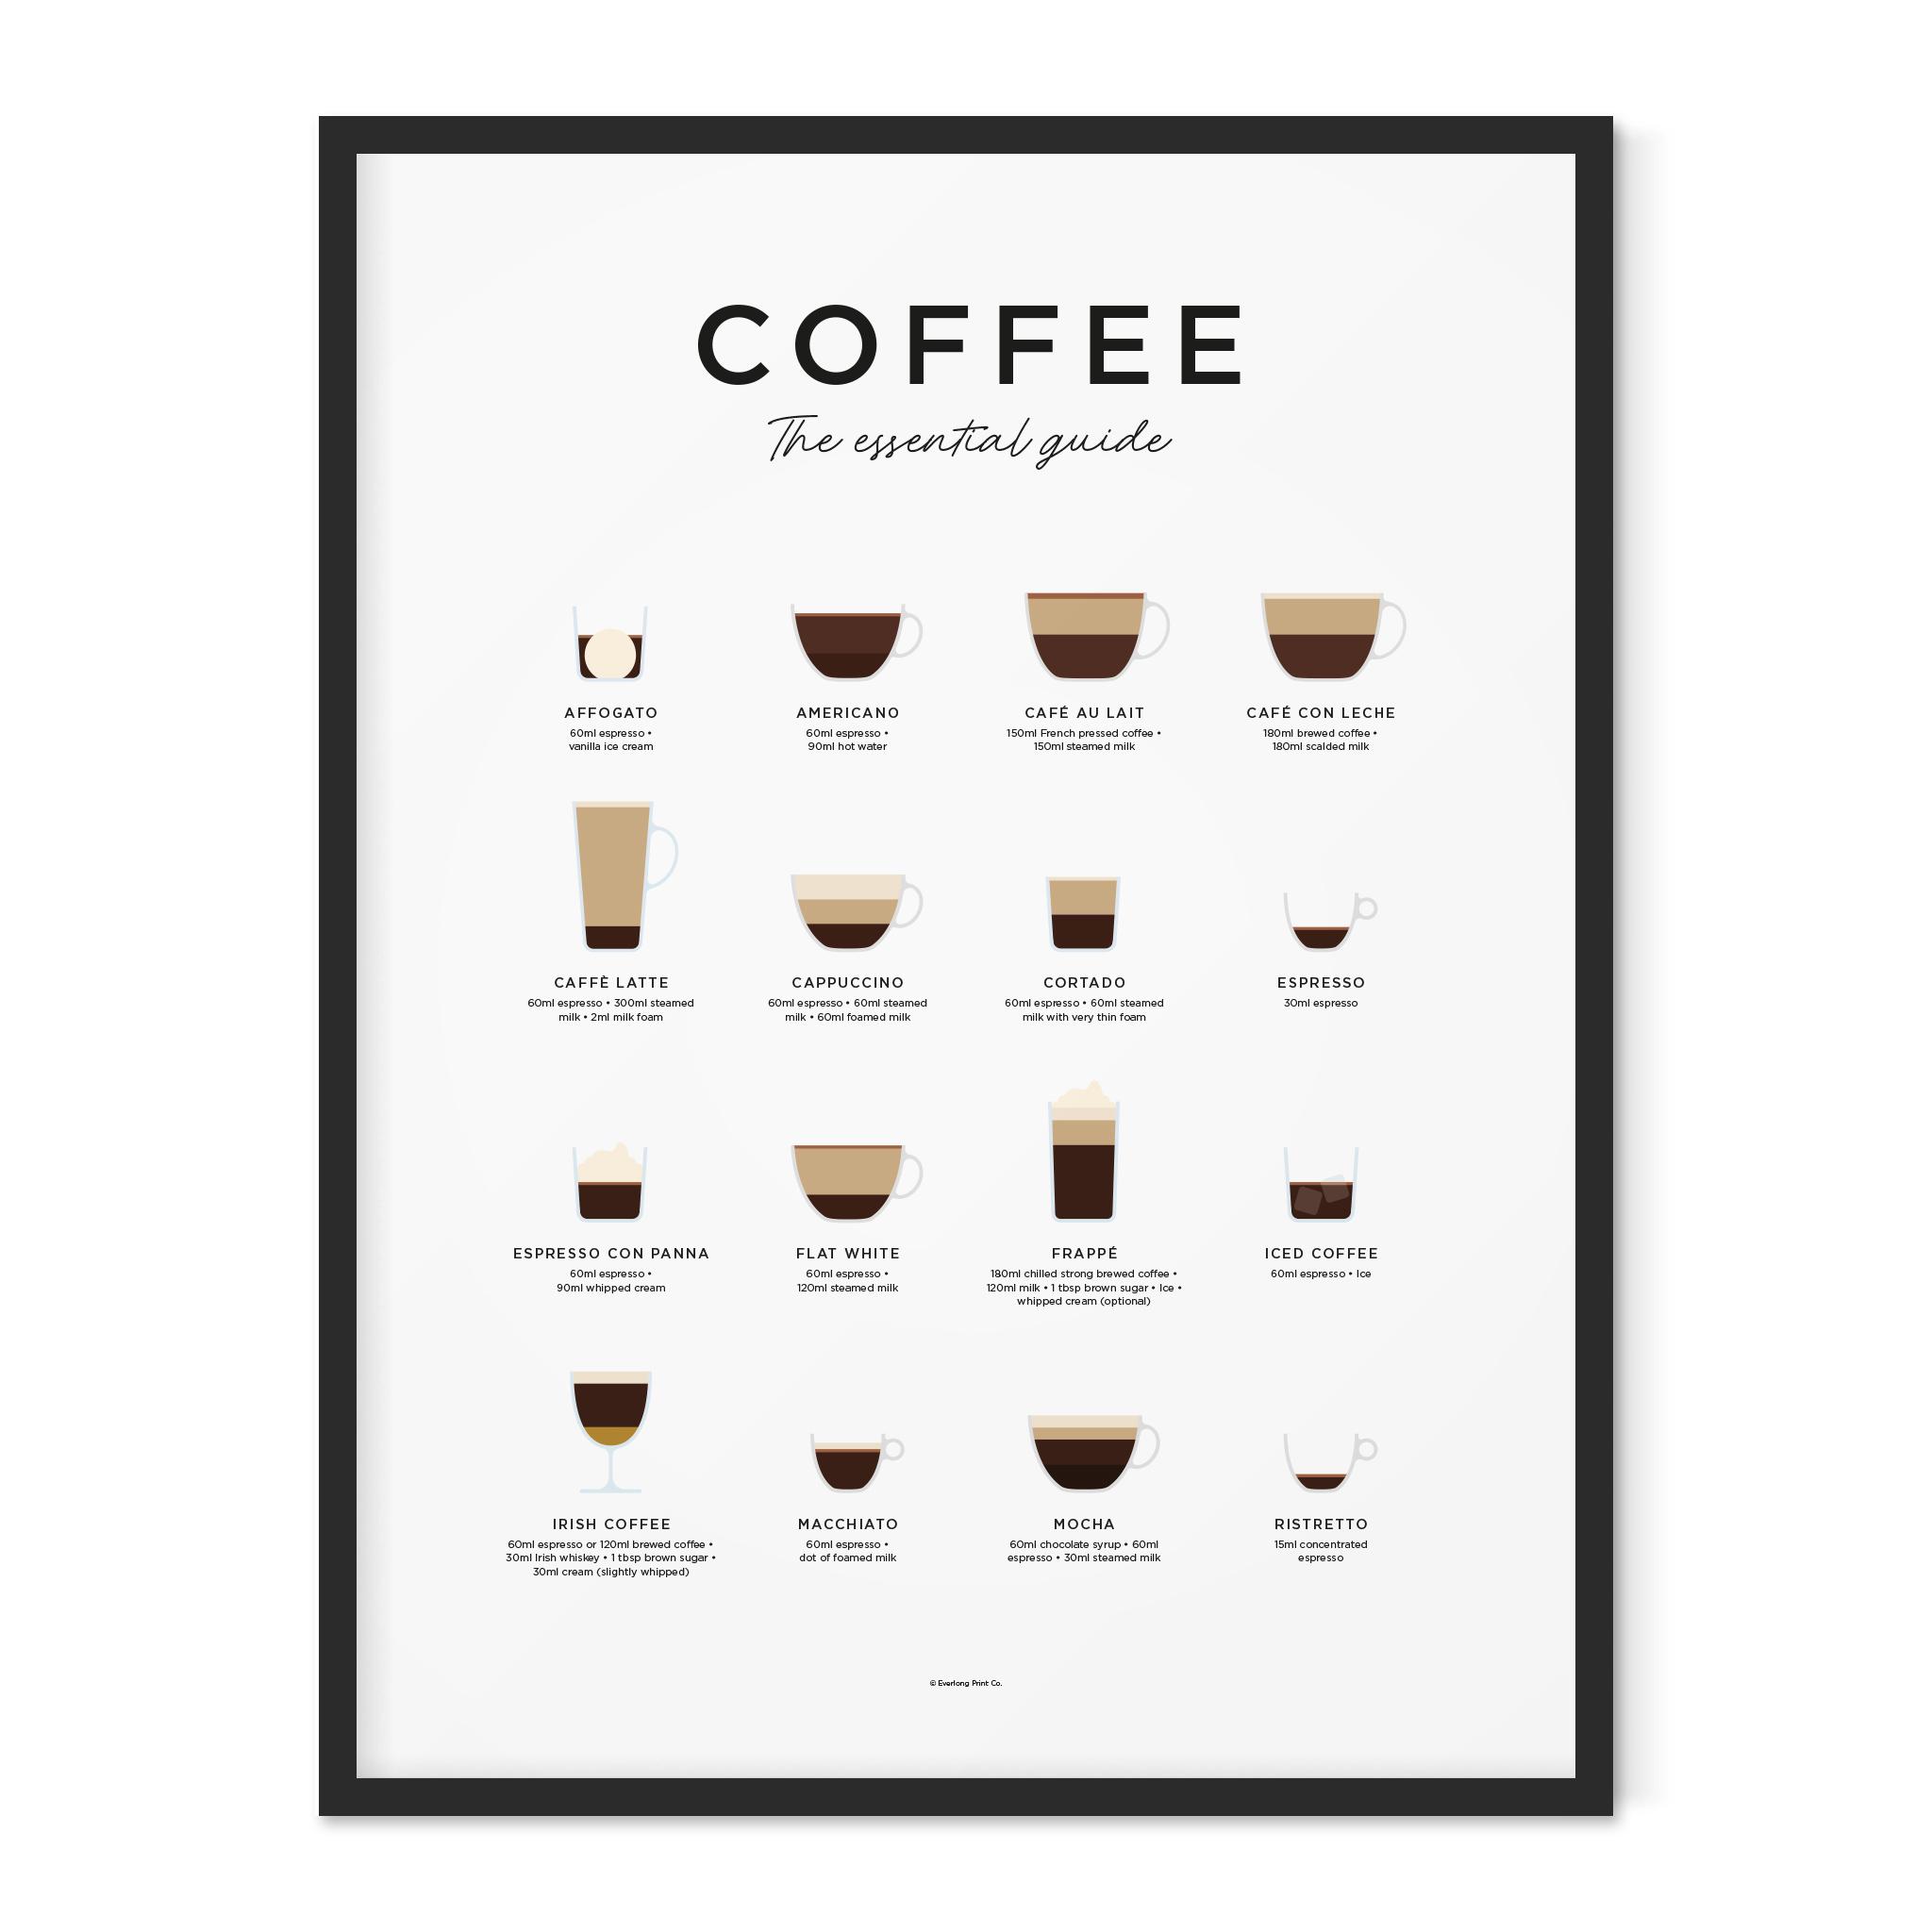 coffee guide 3